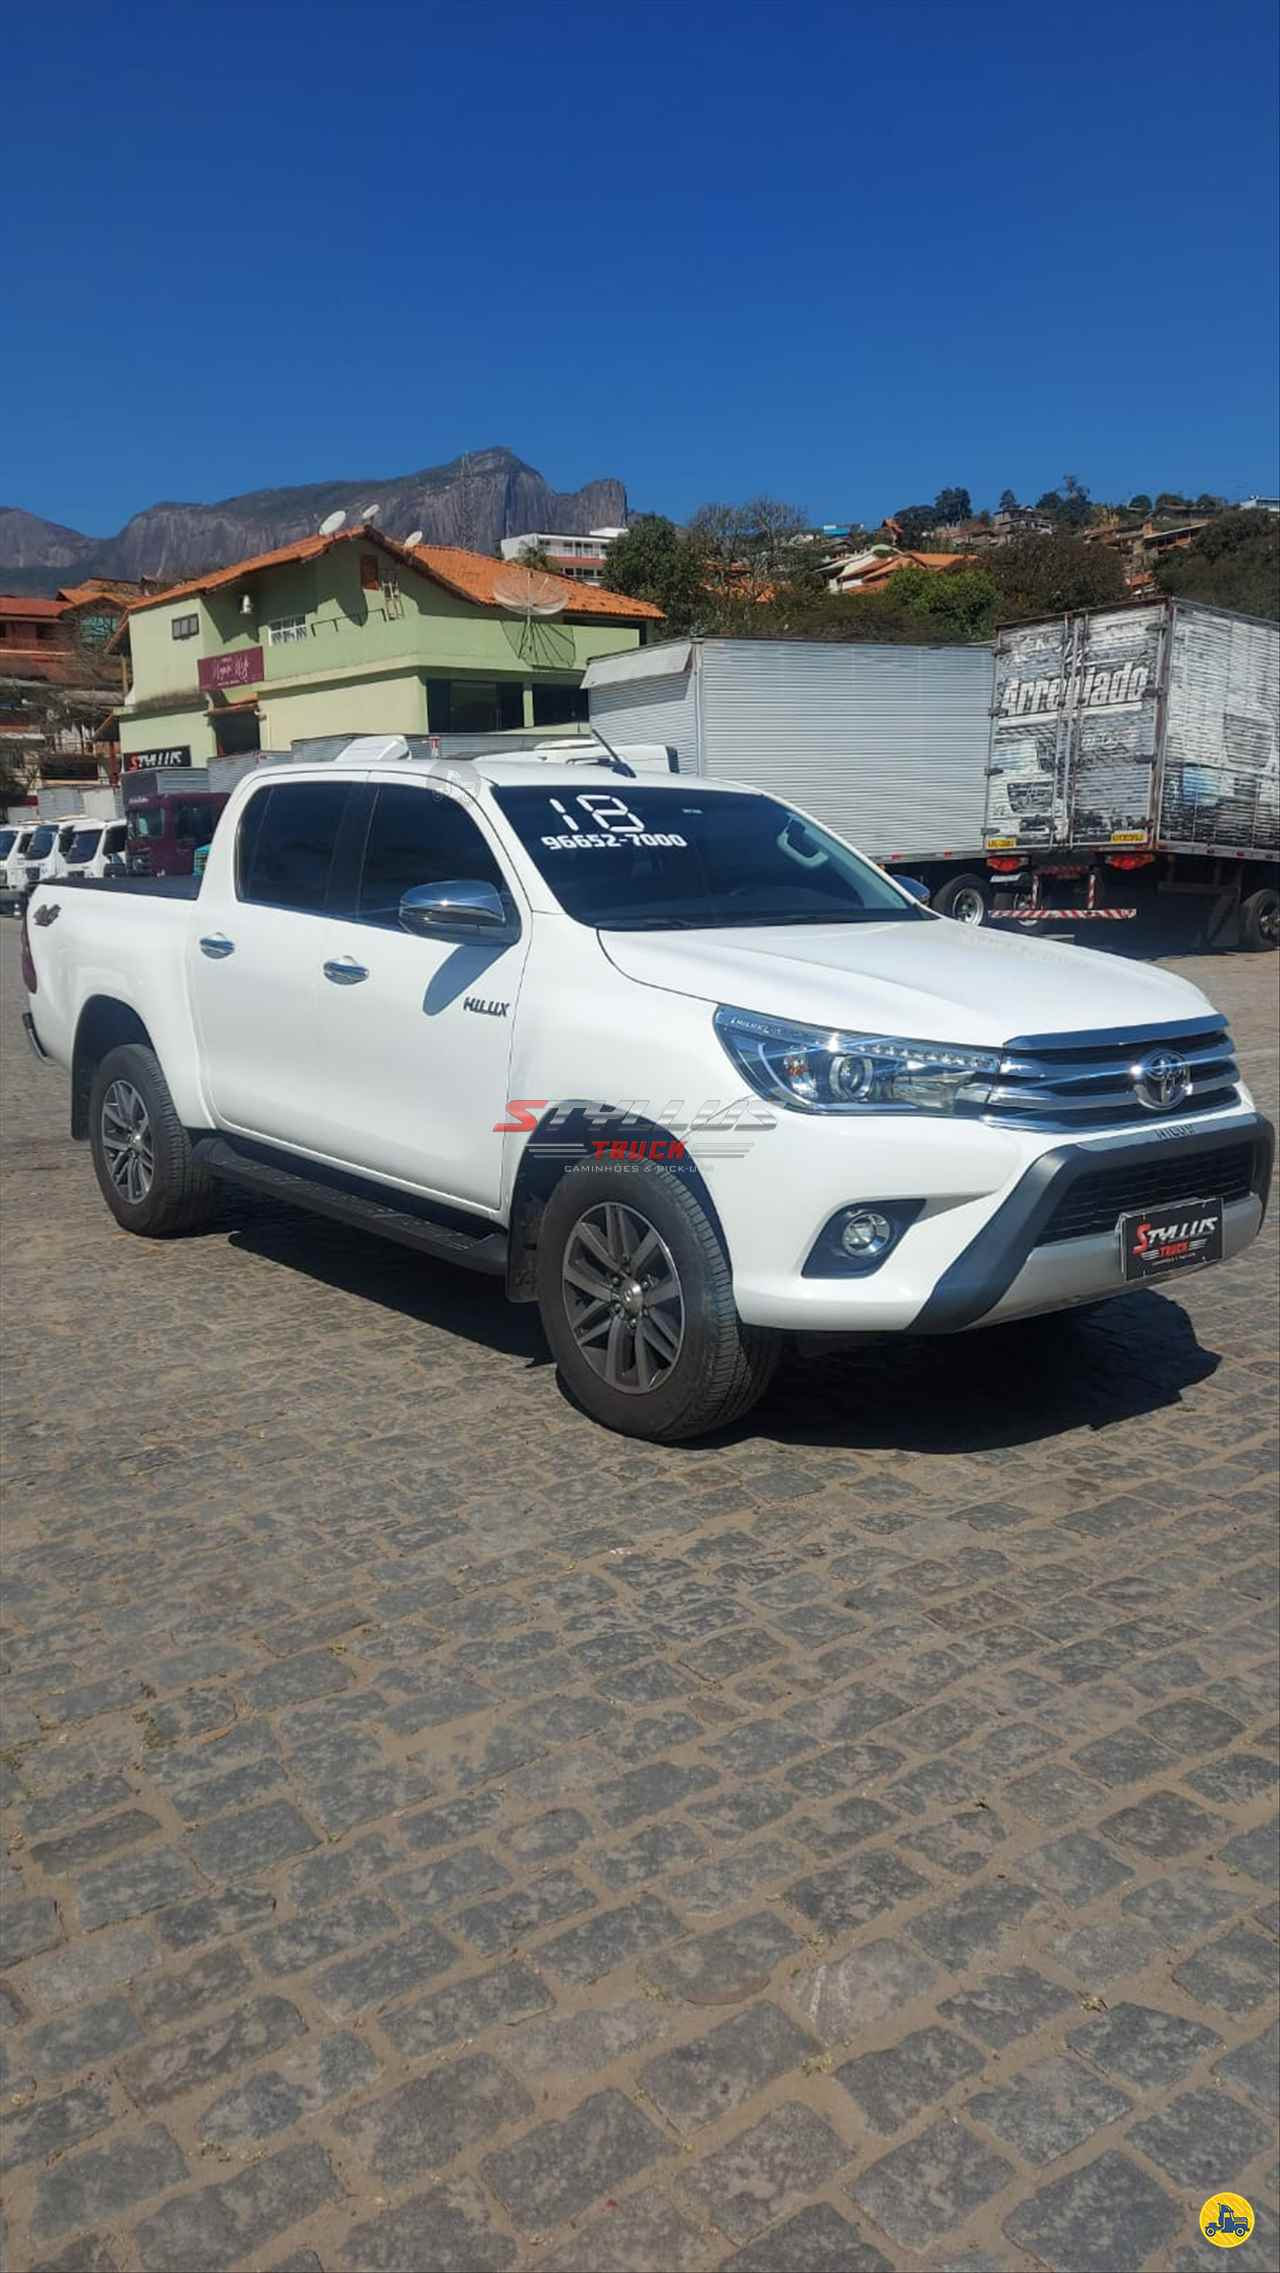 CARRO TOYOTA Hilux 2.8 SRX Styllus Truck TERESOPOLIS RIO DE JANEIRO RJ